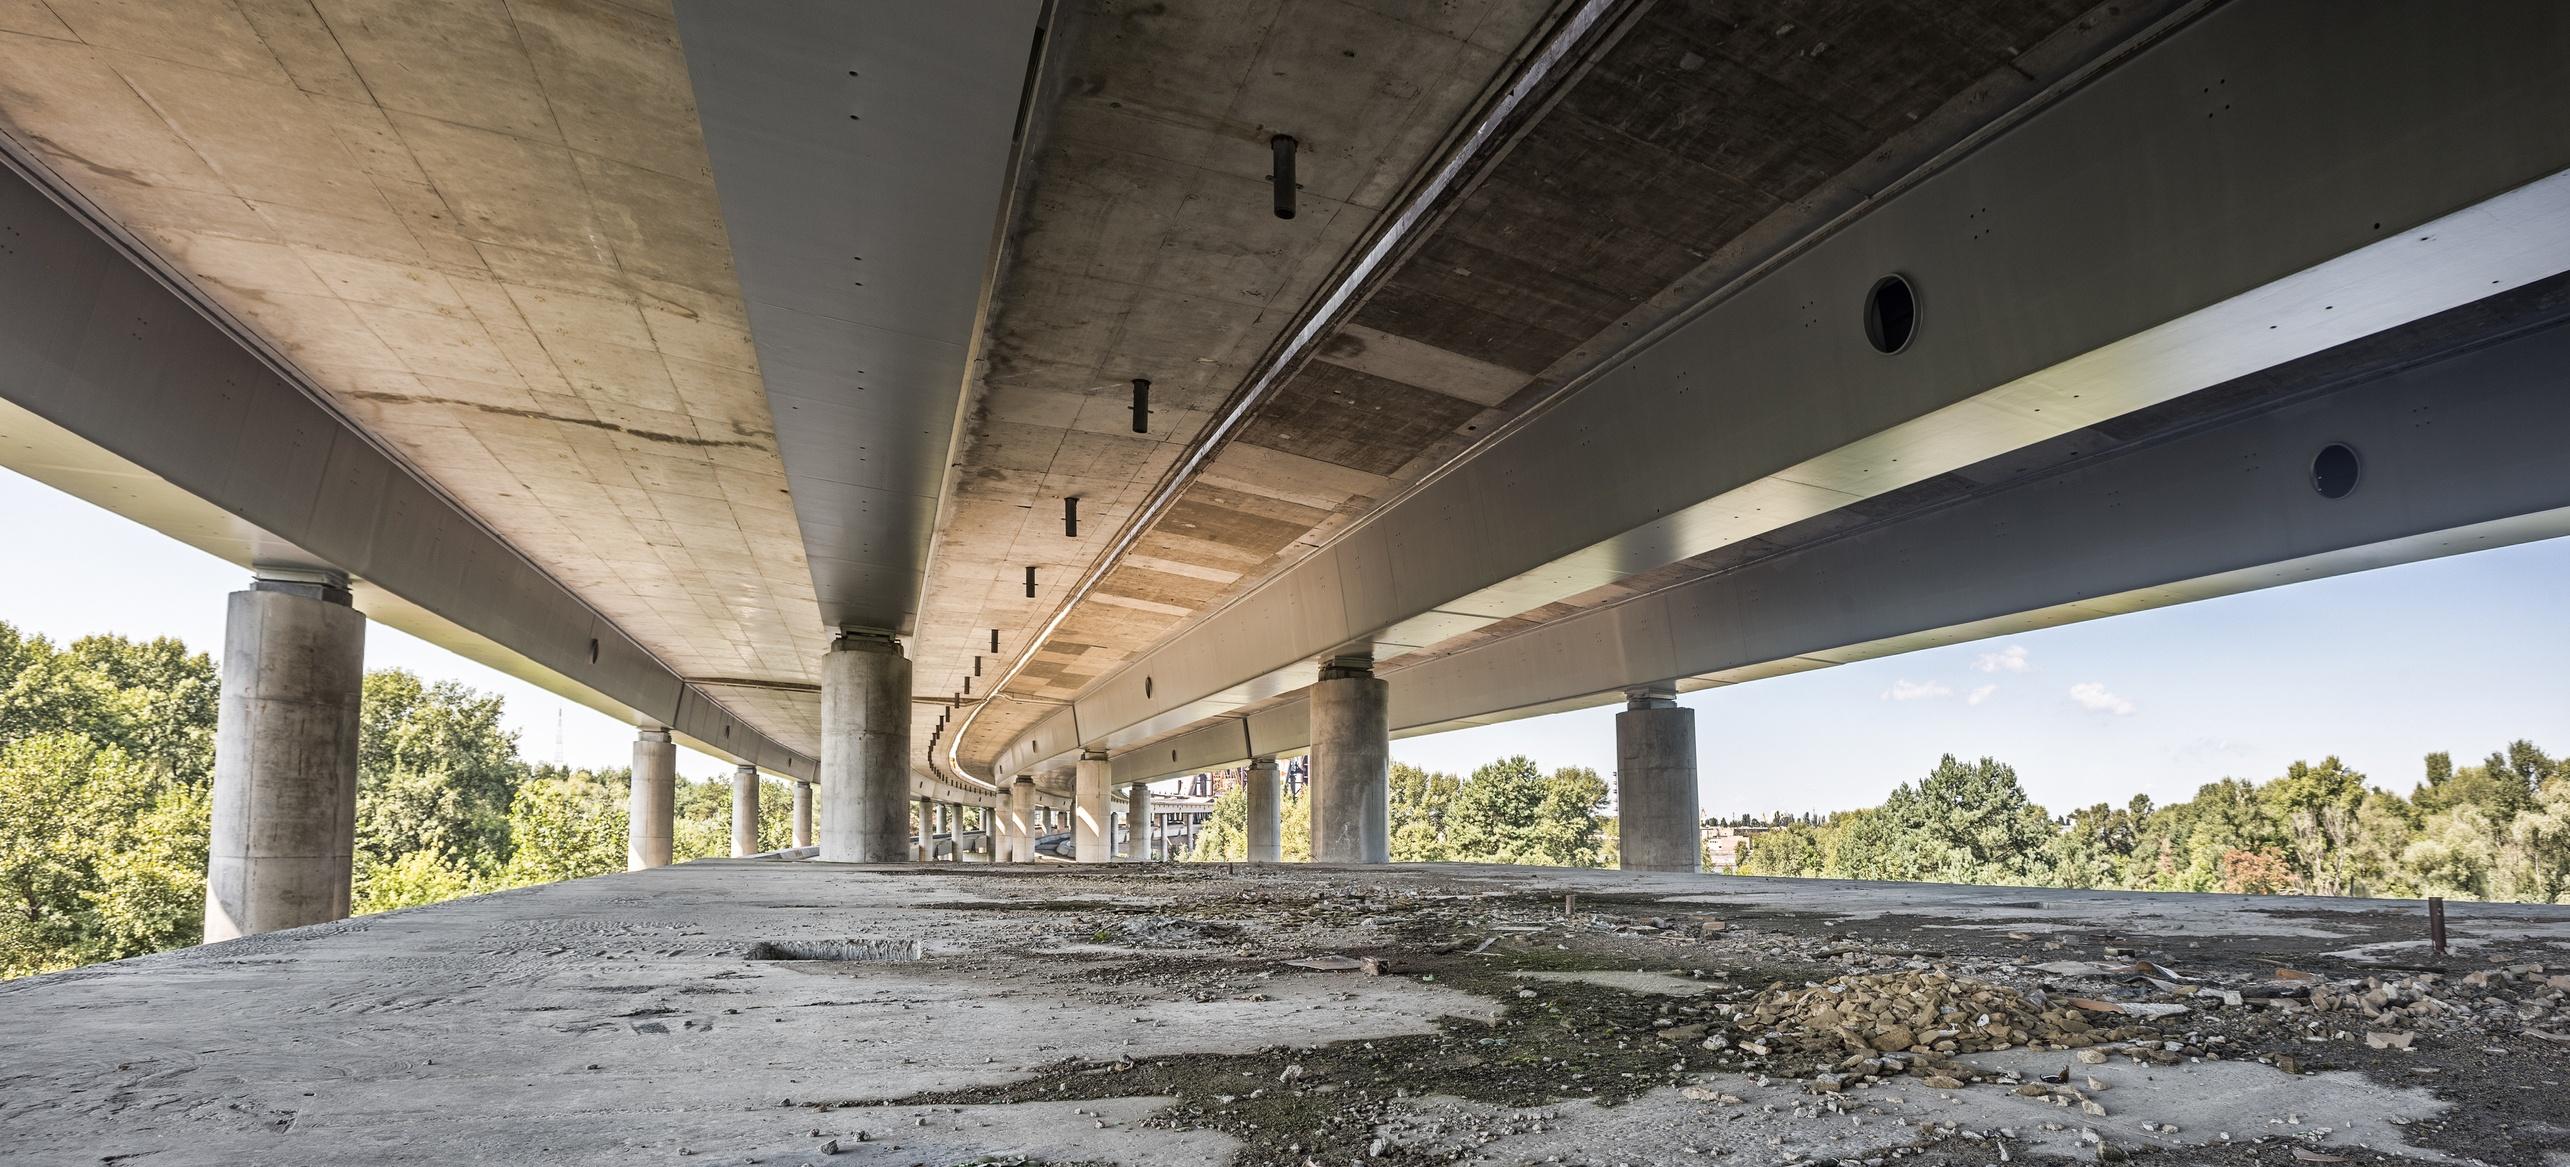 Bridge Rehabilitation Completed with UHPC Concrete